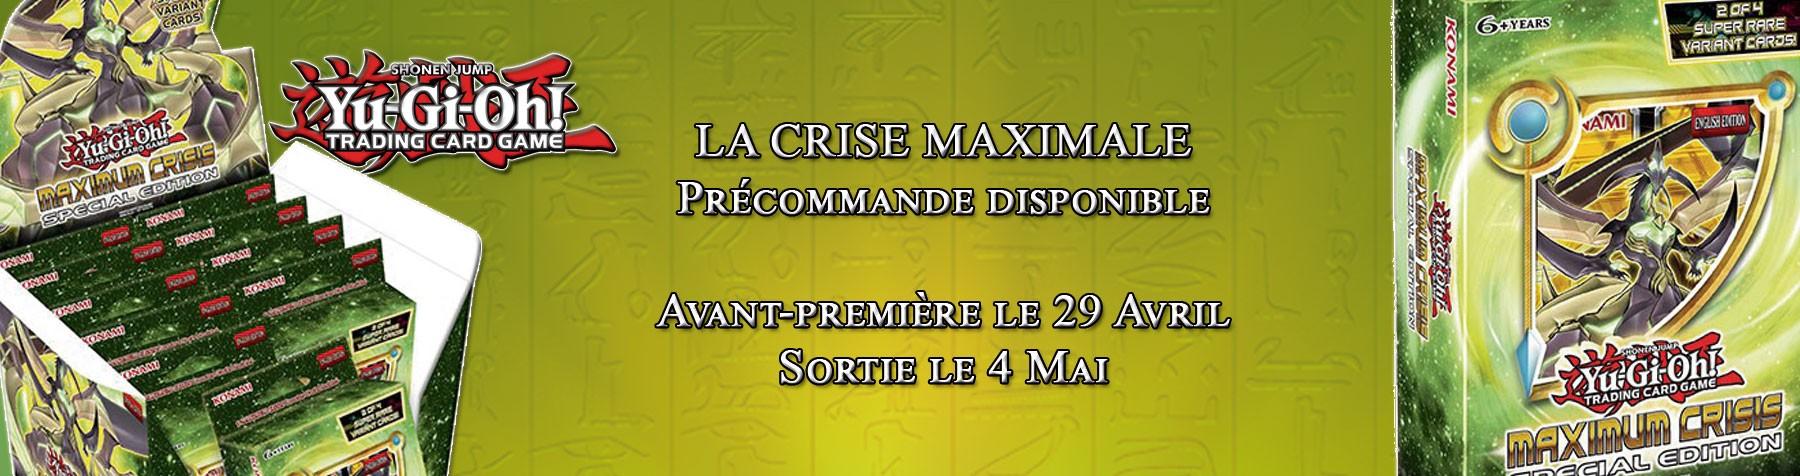 Yu-Gi-Oh ! La Crise Maximale !